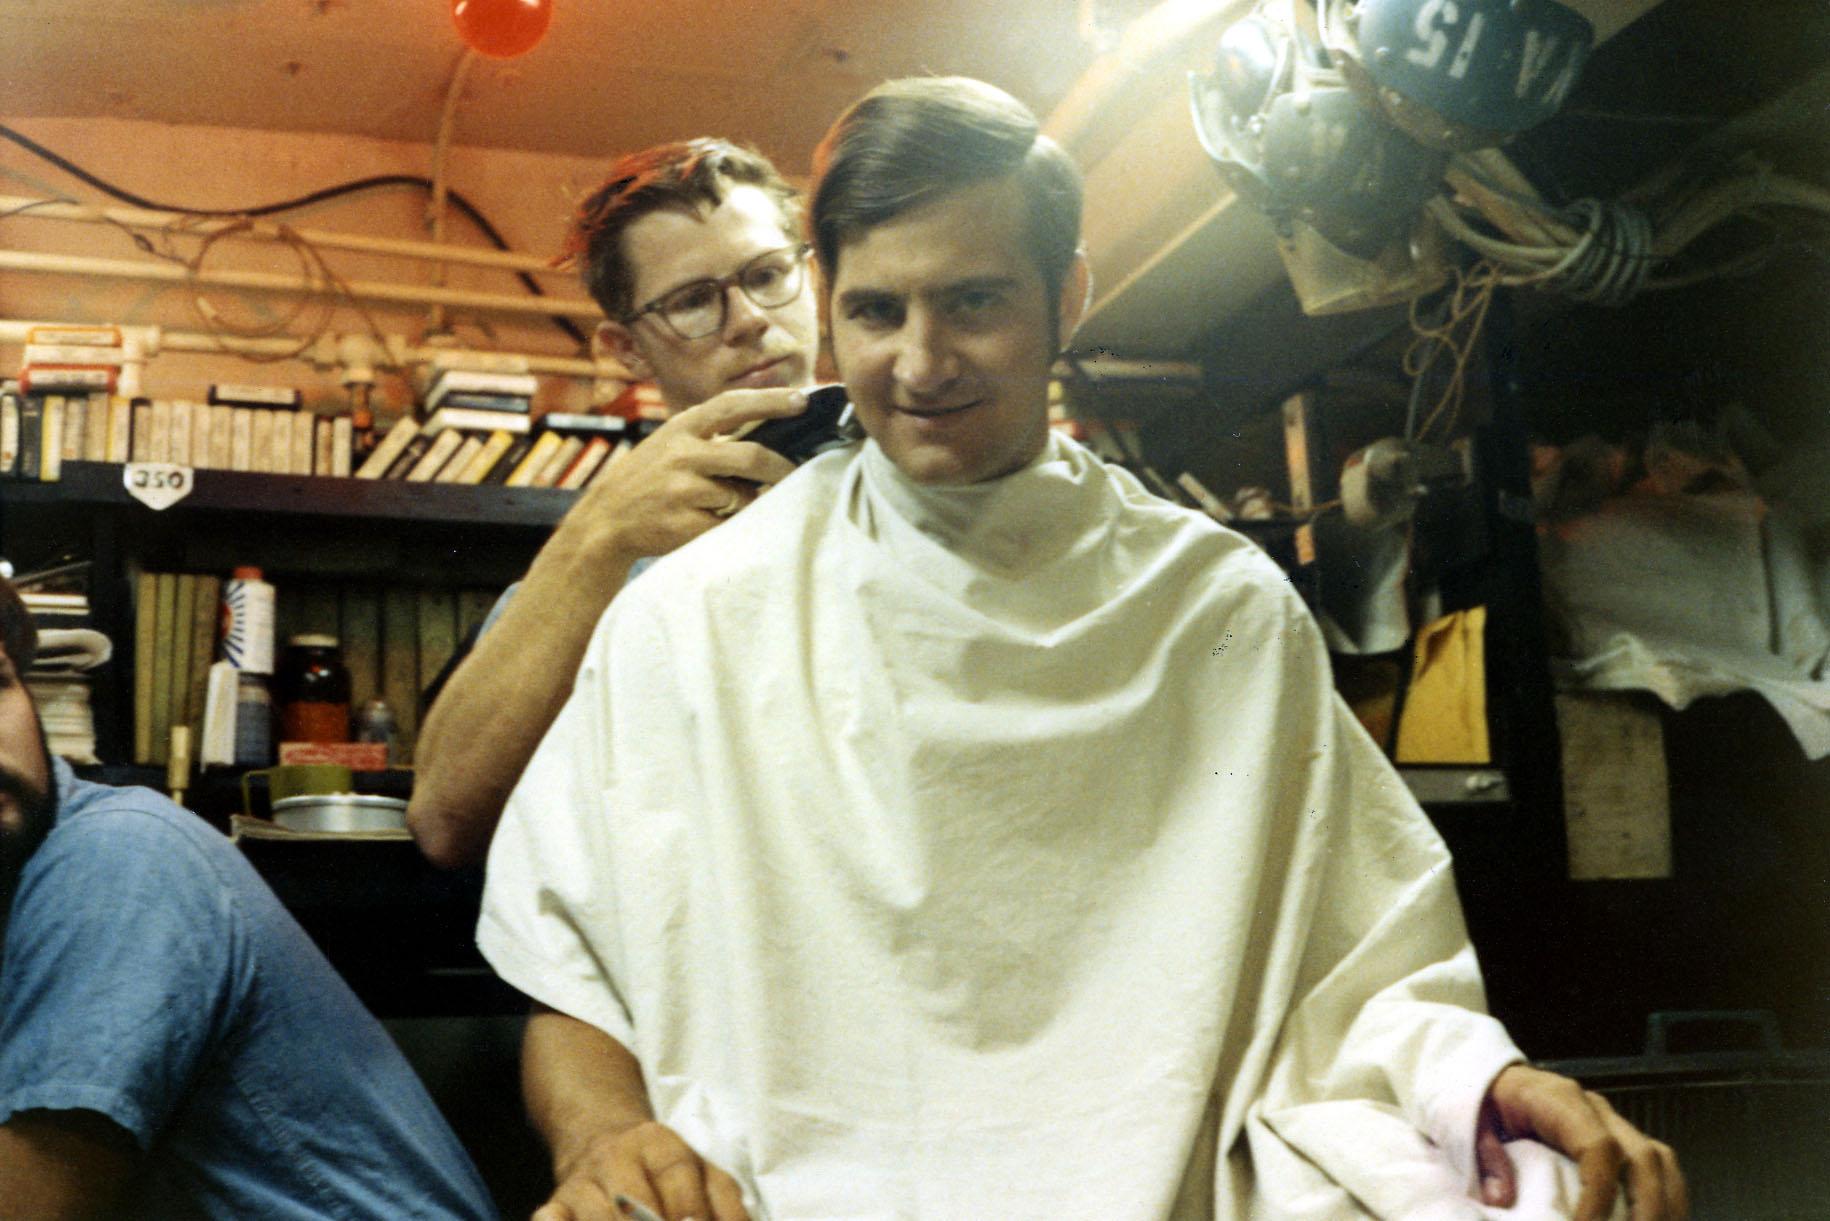 06-higgins-giving-dana-guntrum-haircut-w